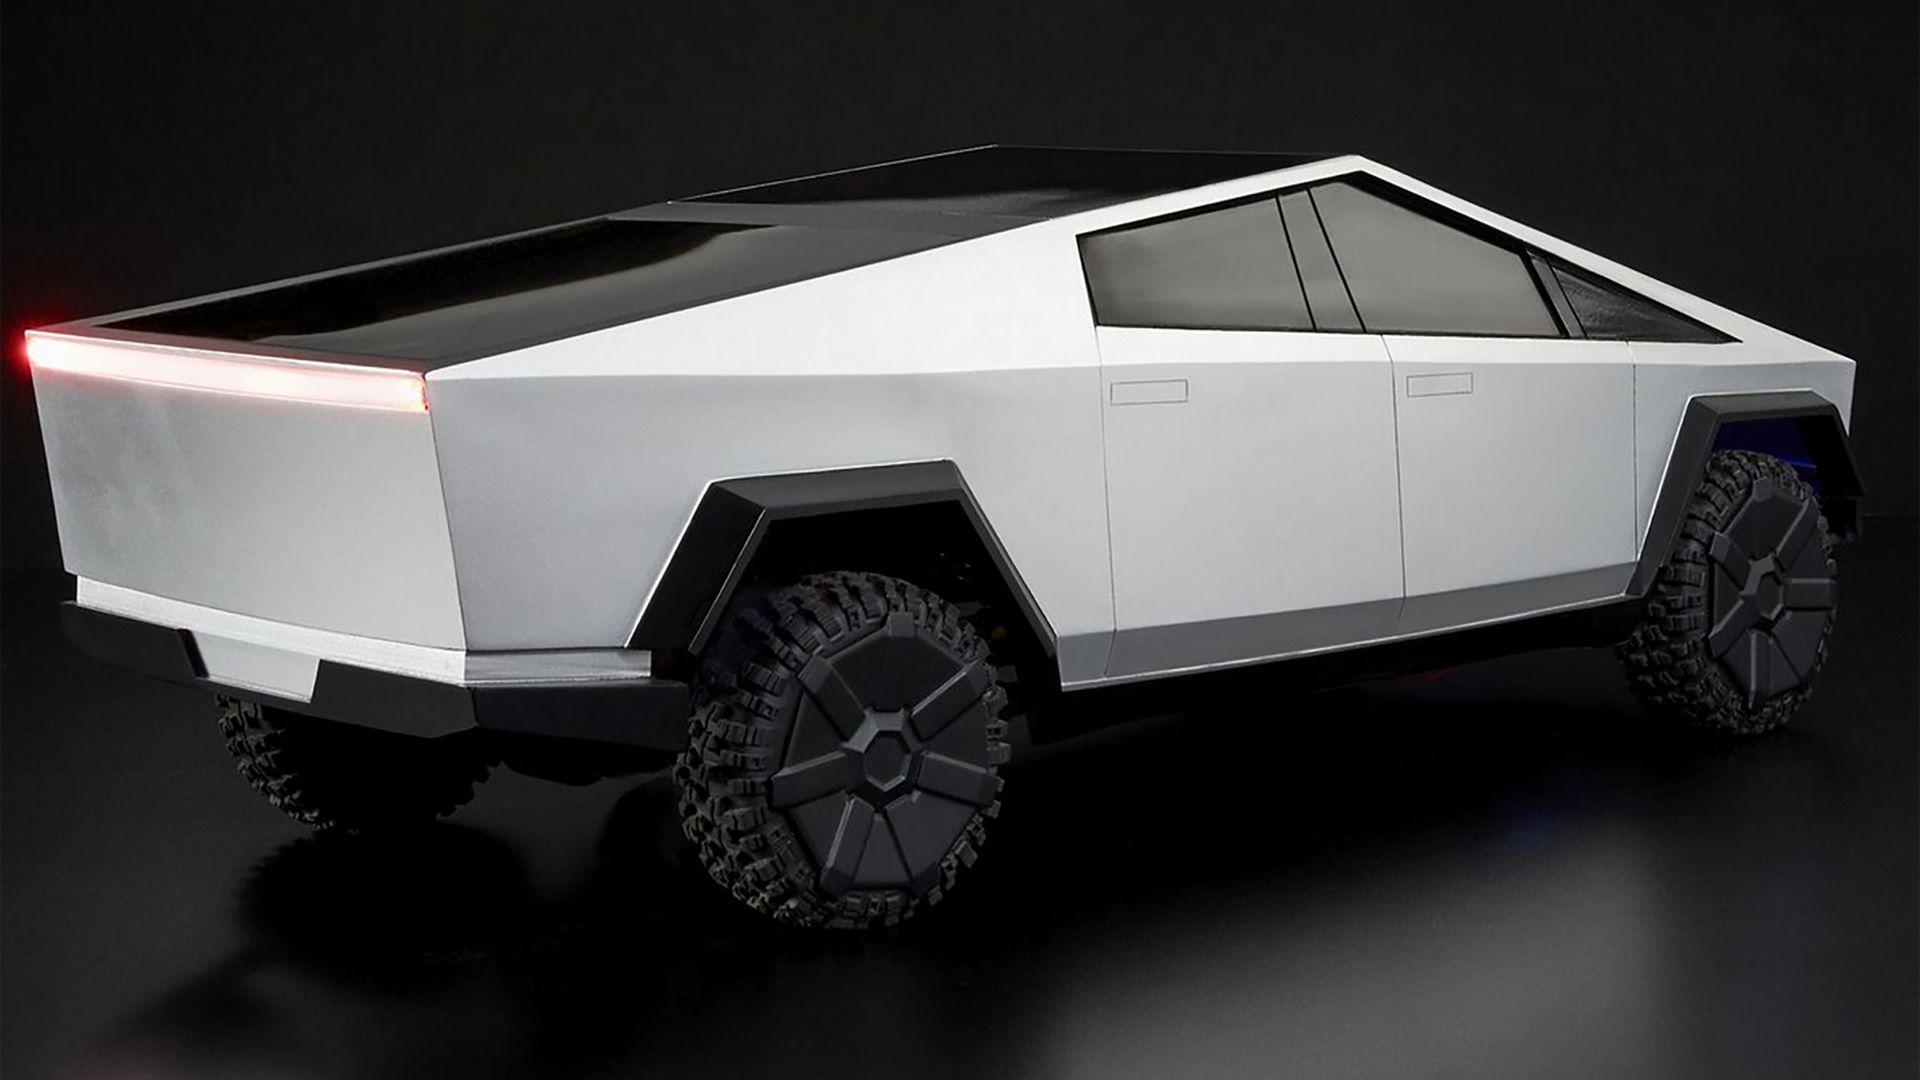 Hot-Wheels-RC-Tesla-Cybertruck-12